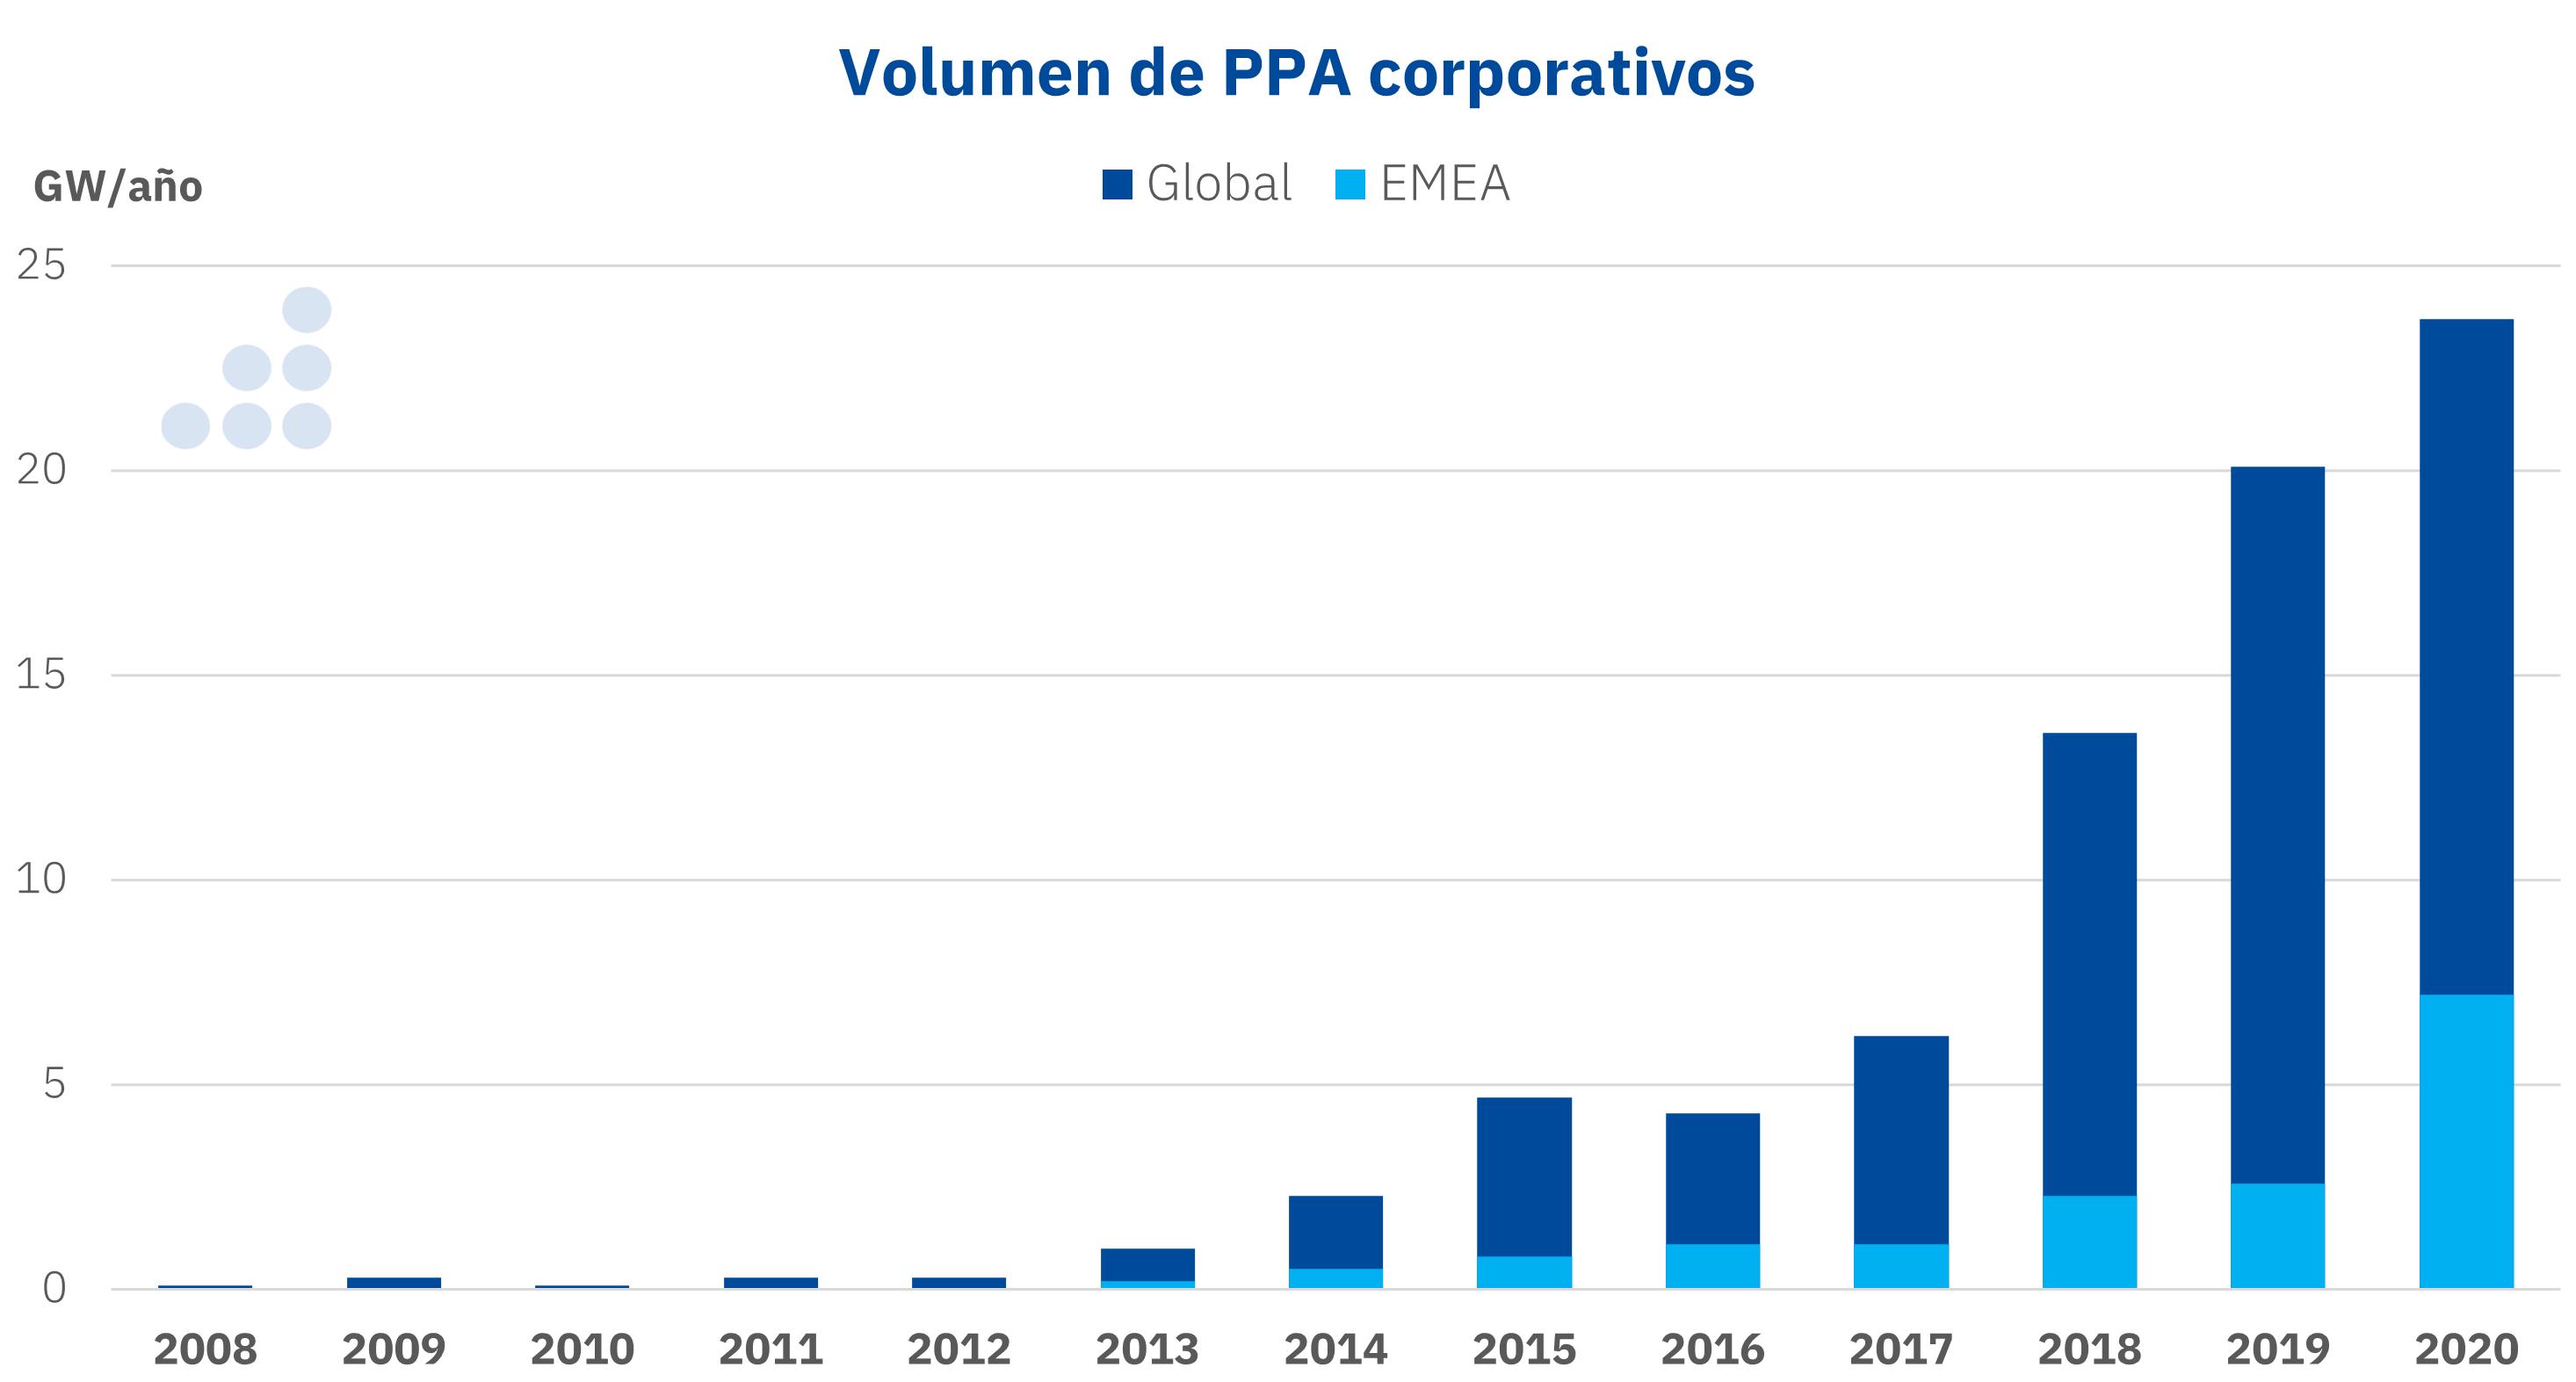 AleaSoft - PPA corporativos